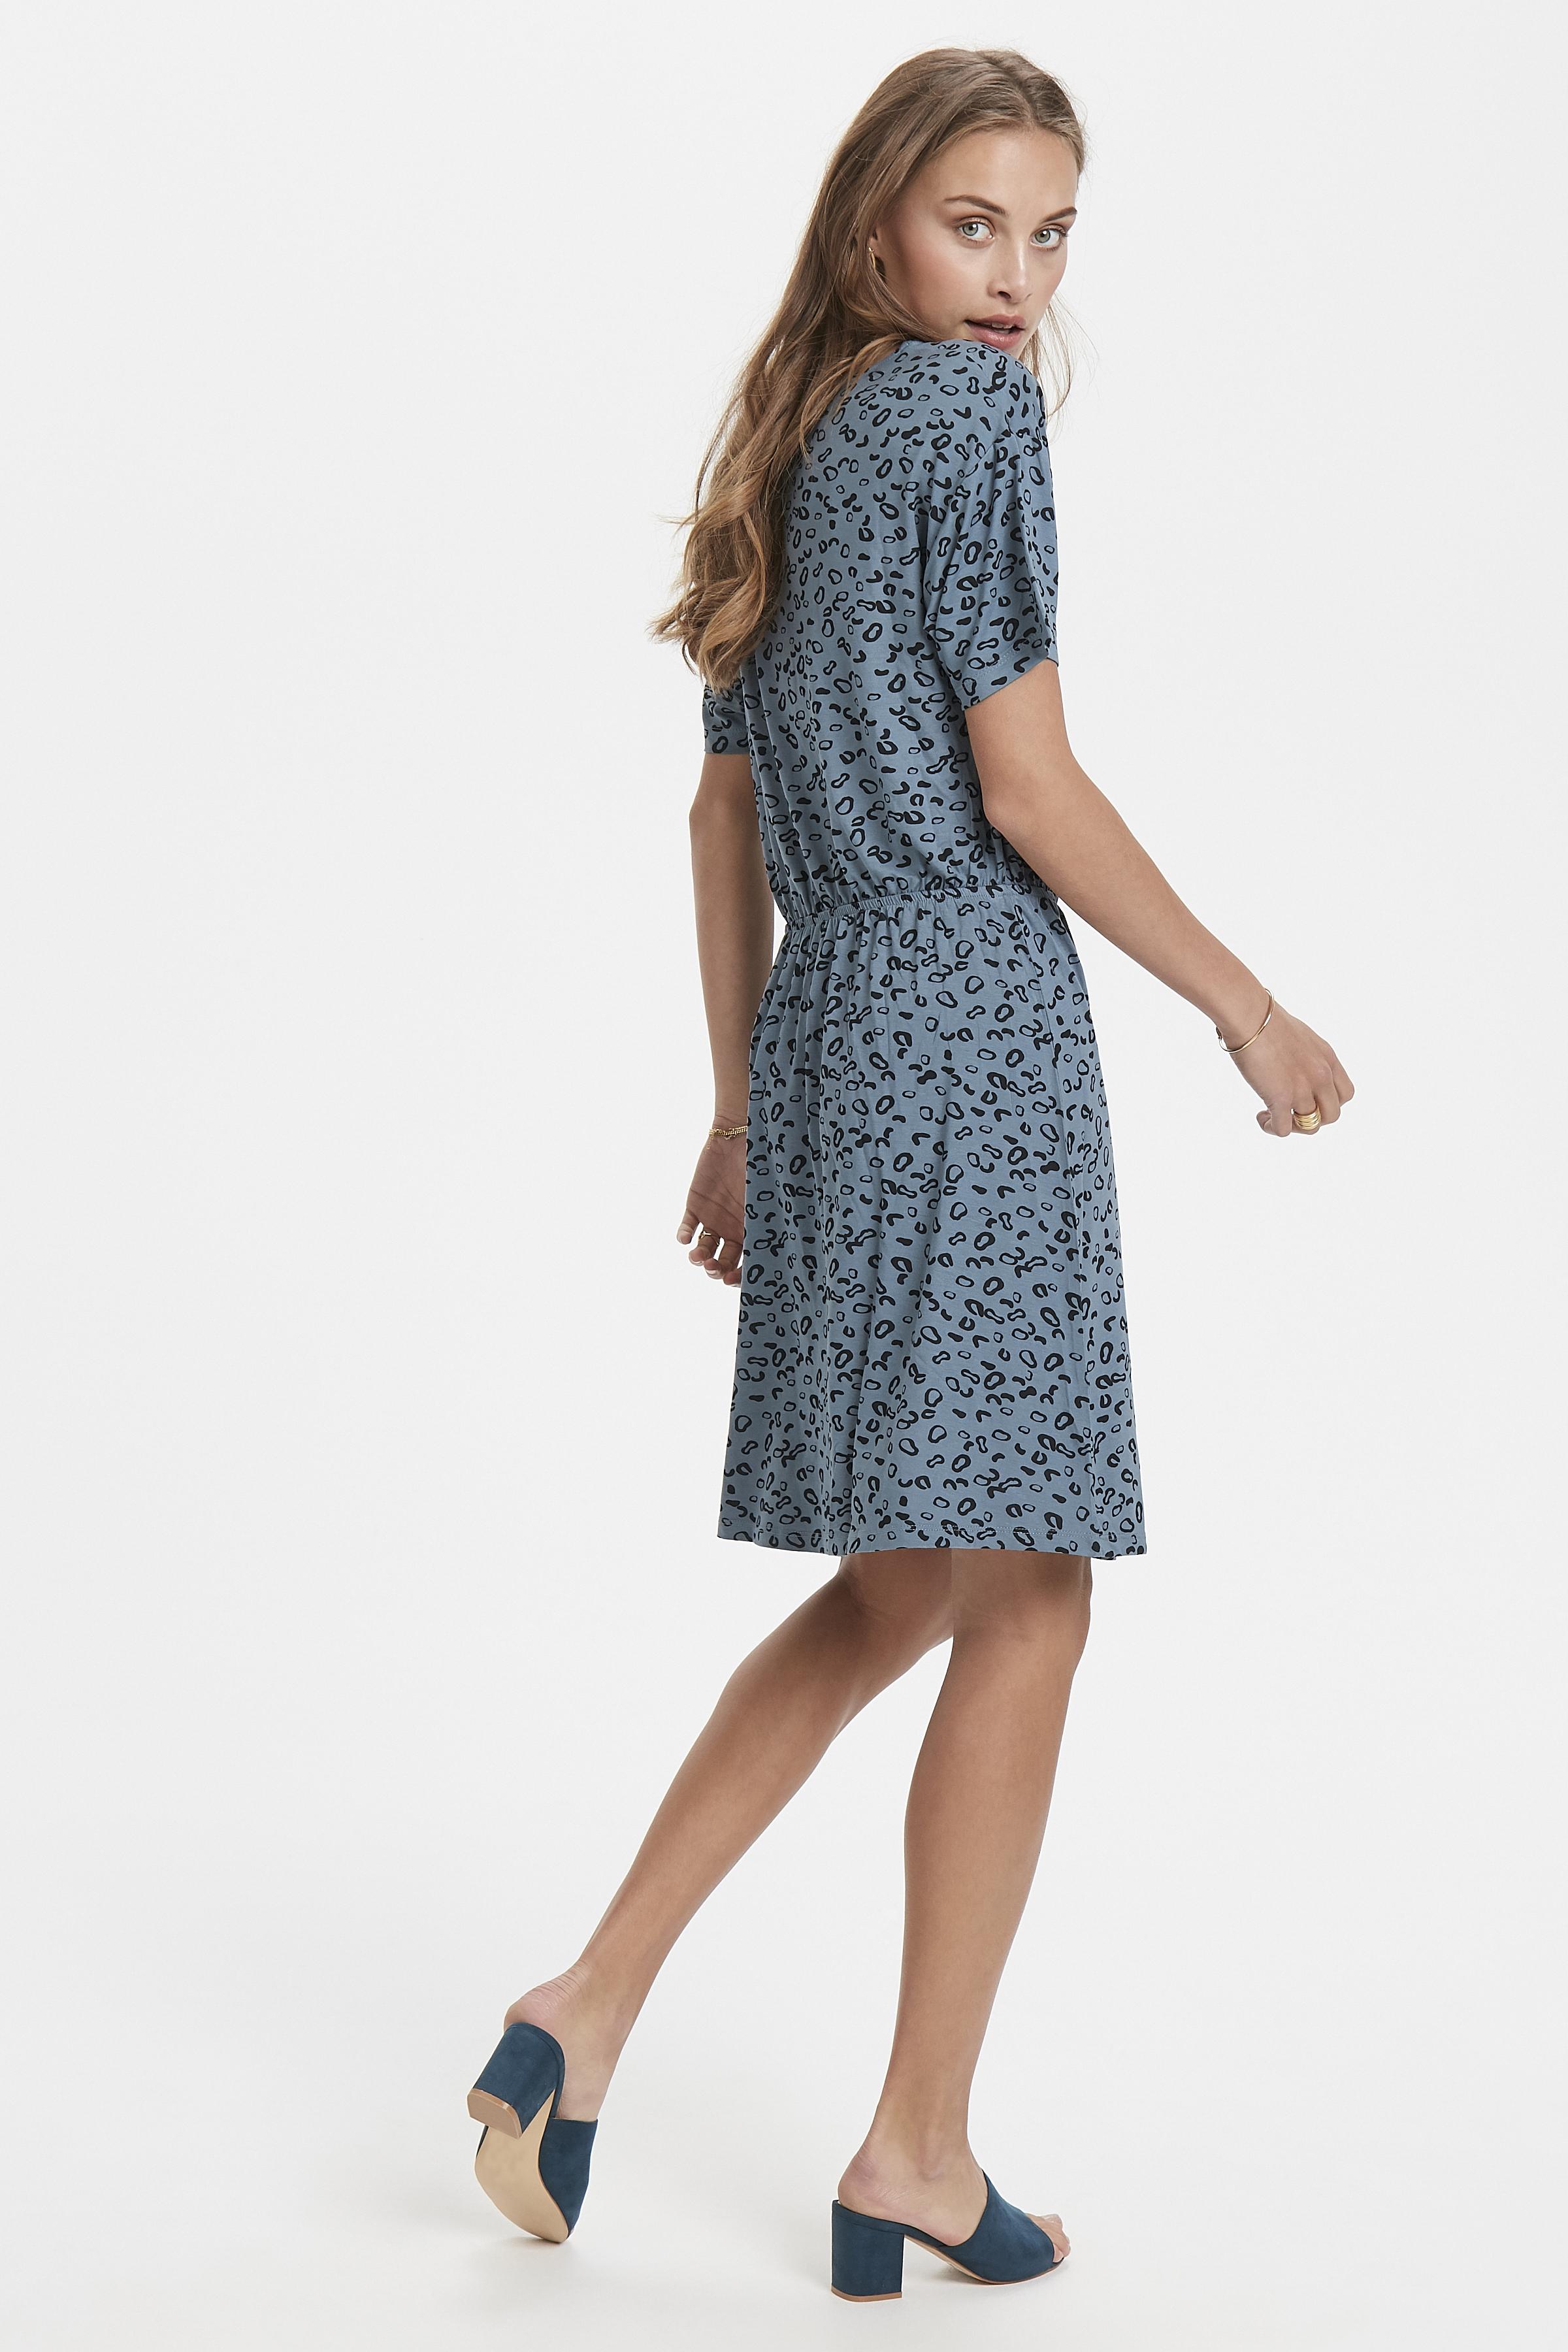 Blue Mirage Jerseykjole – Køb Blue Mirage Jerseykjole fra str. XS-XL her